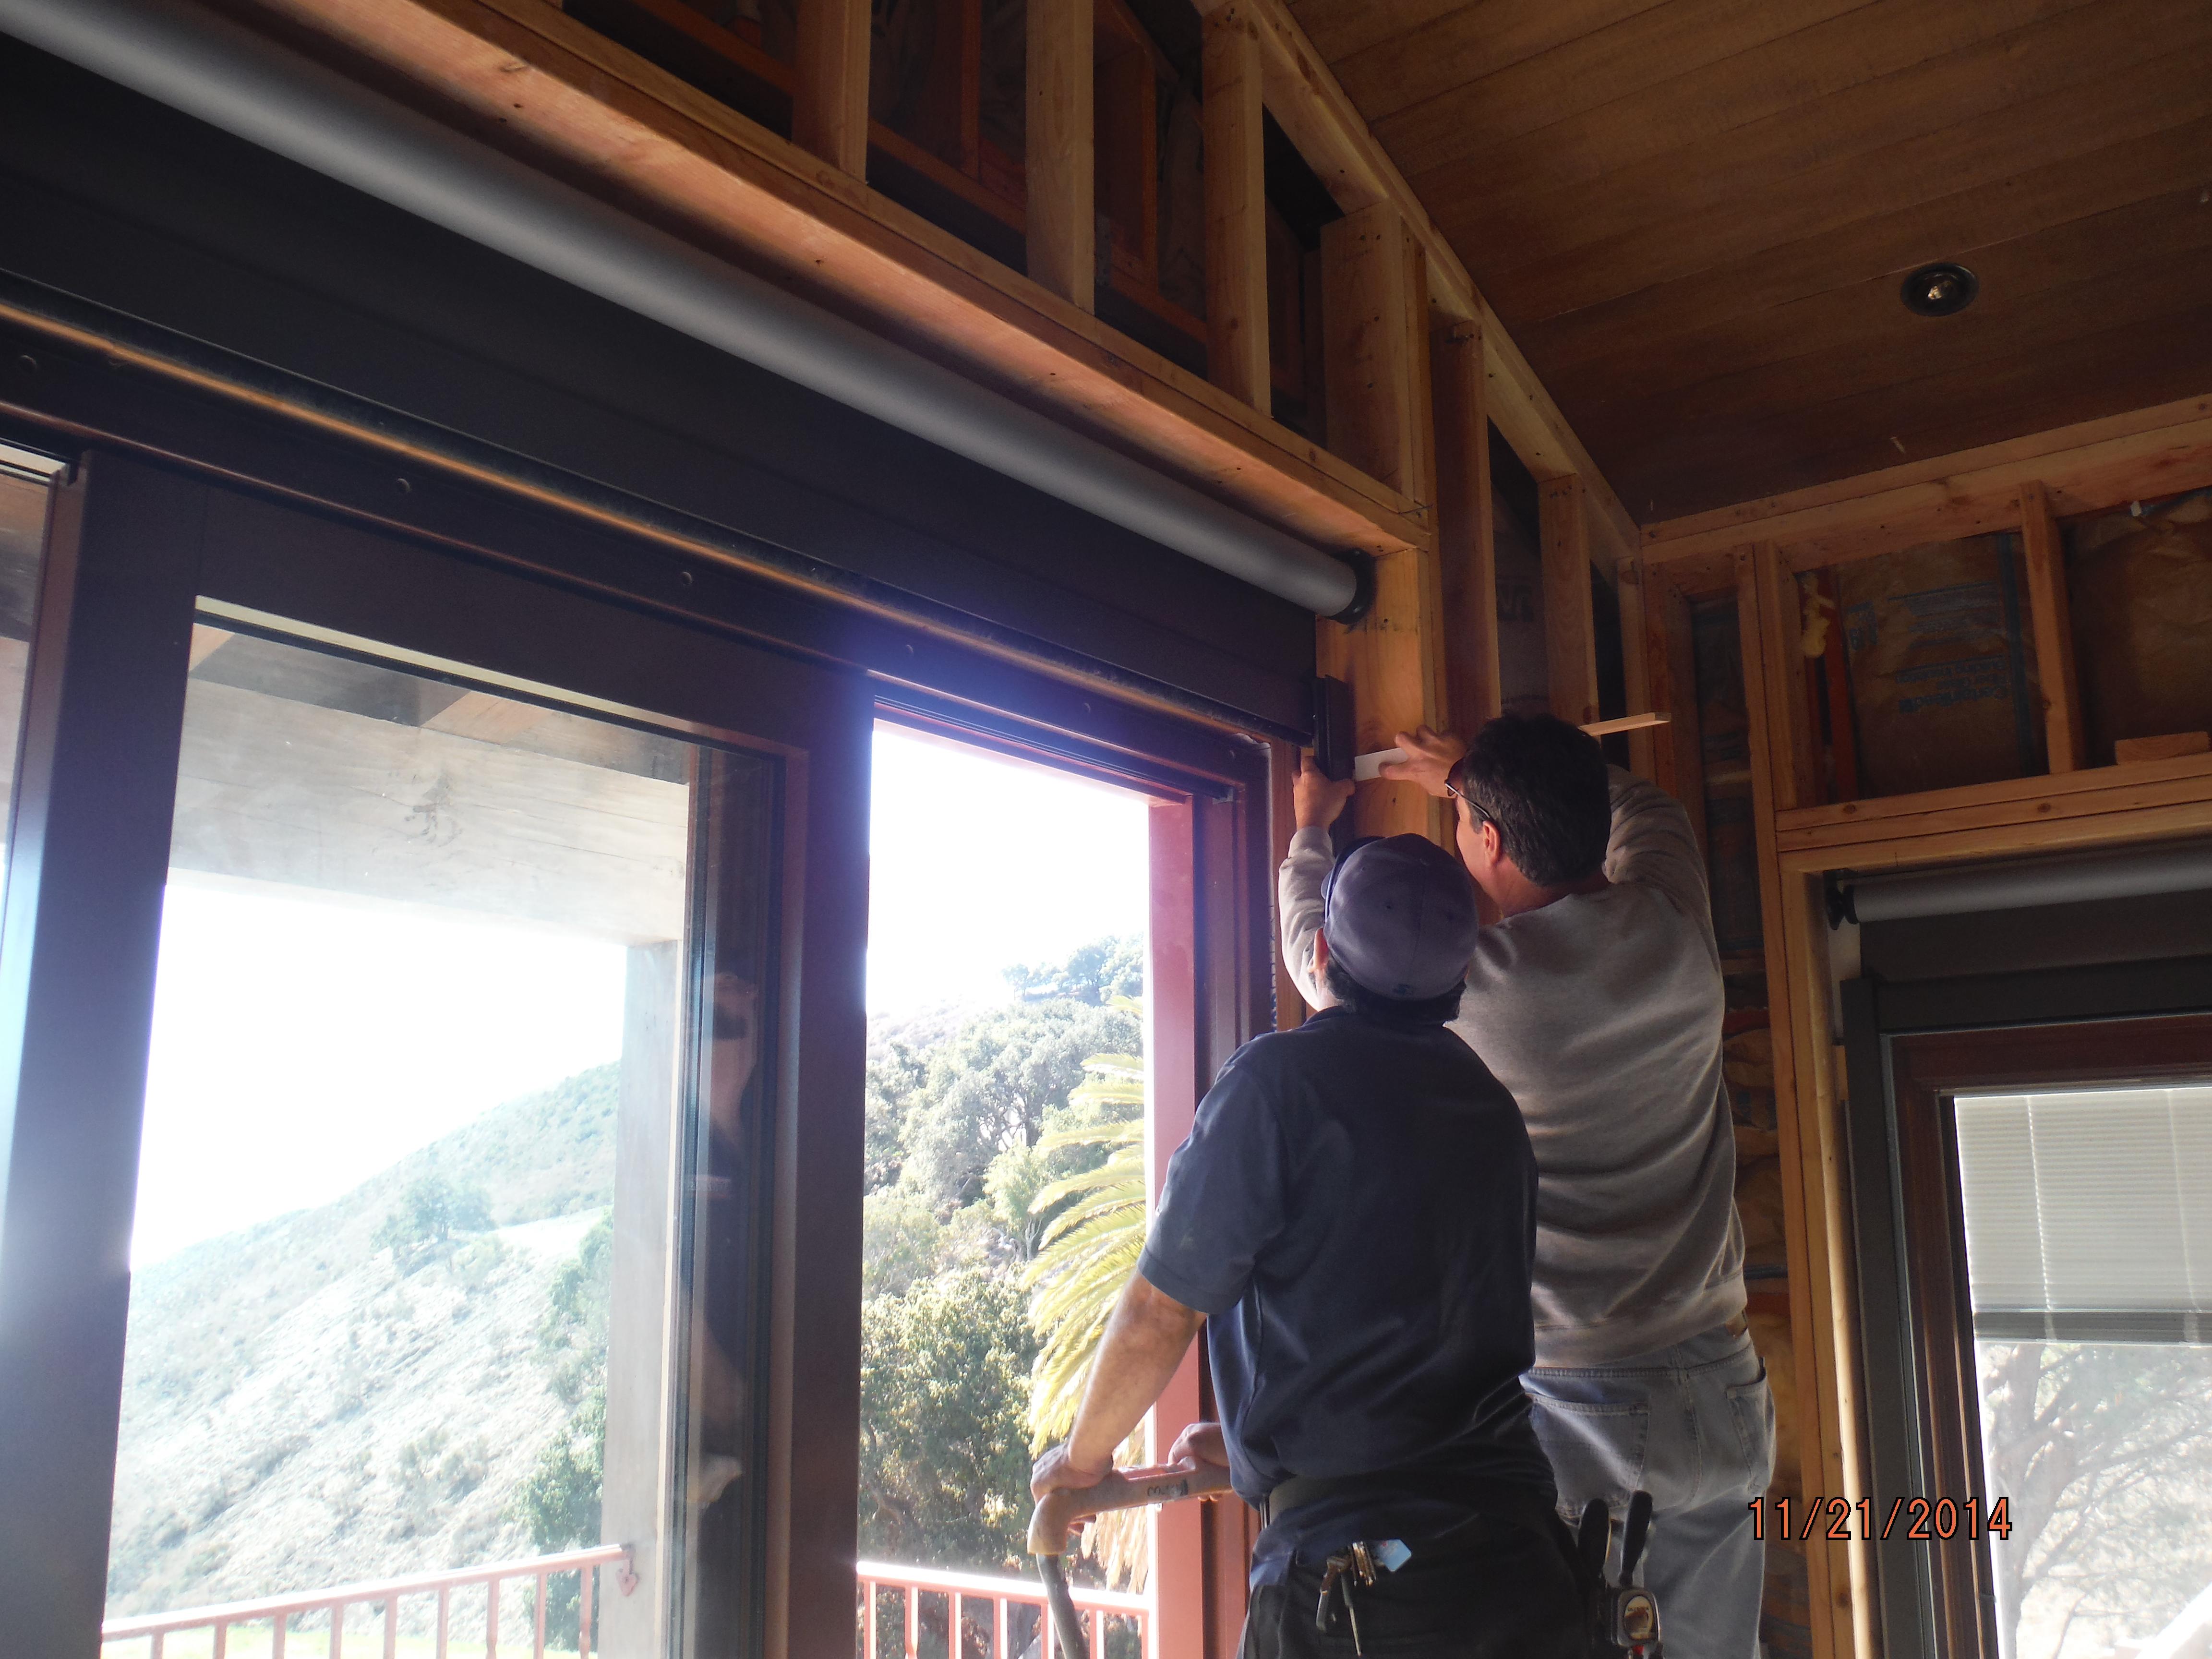 Installation Motorized Power Screens front view bi-folding windows in Santa Barbara in 2nd floor |